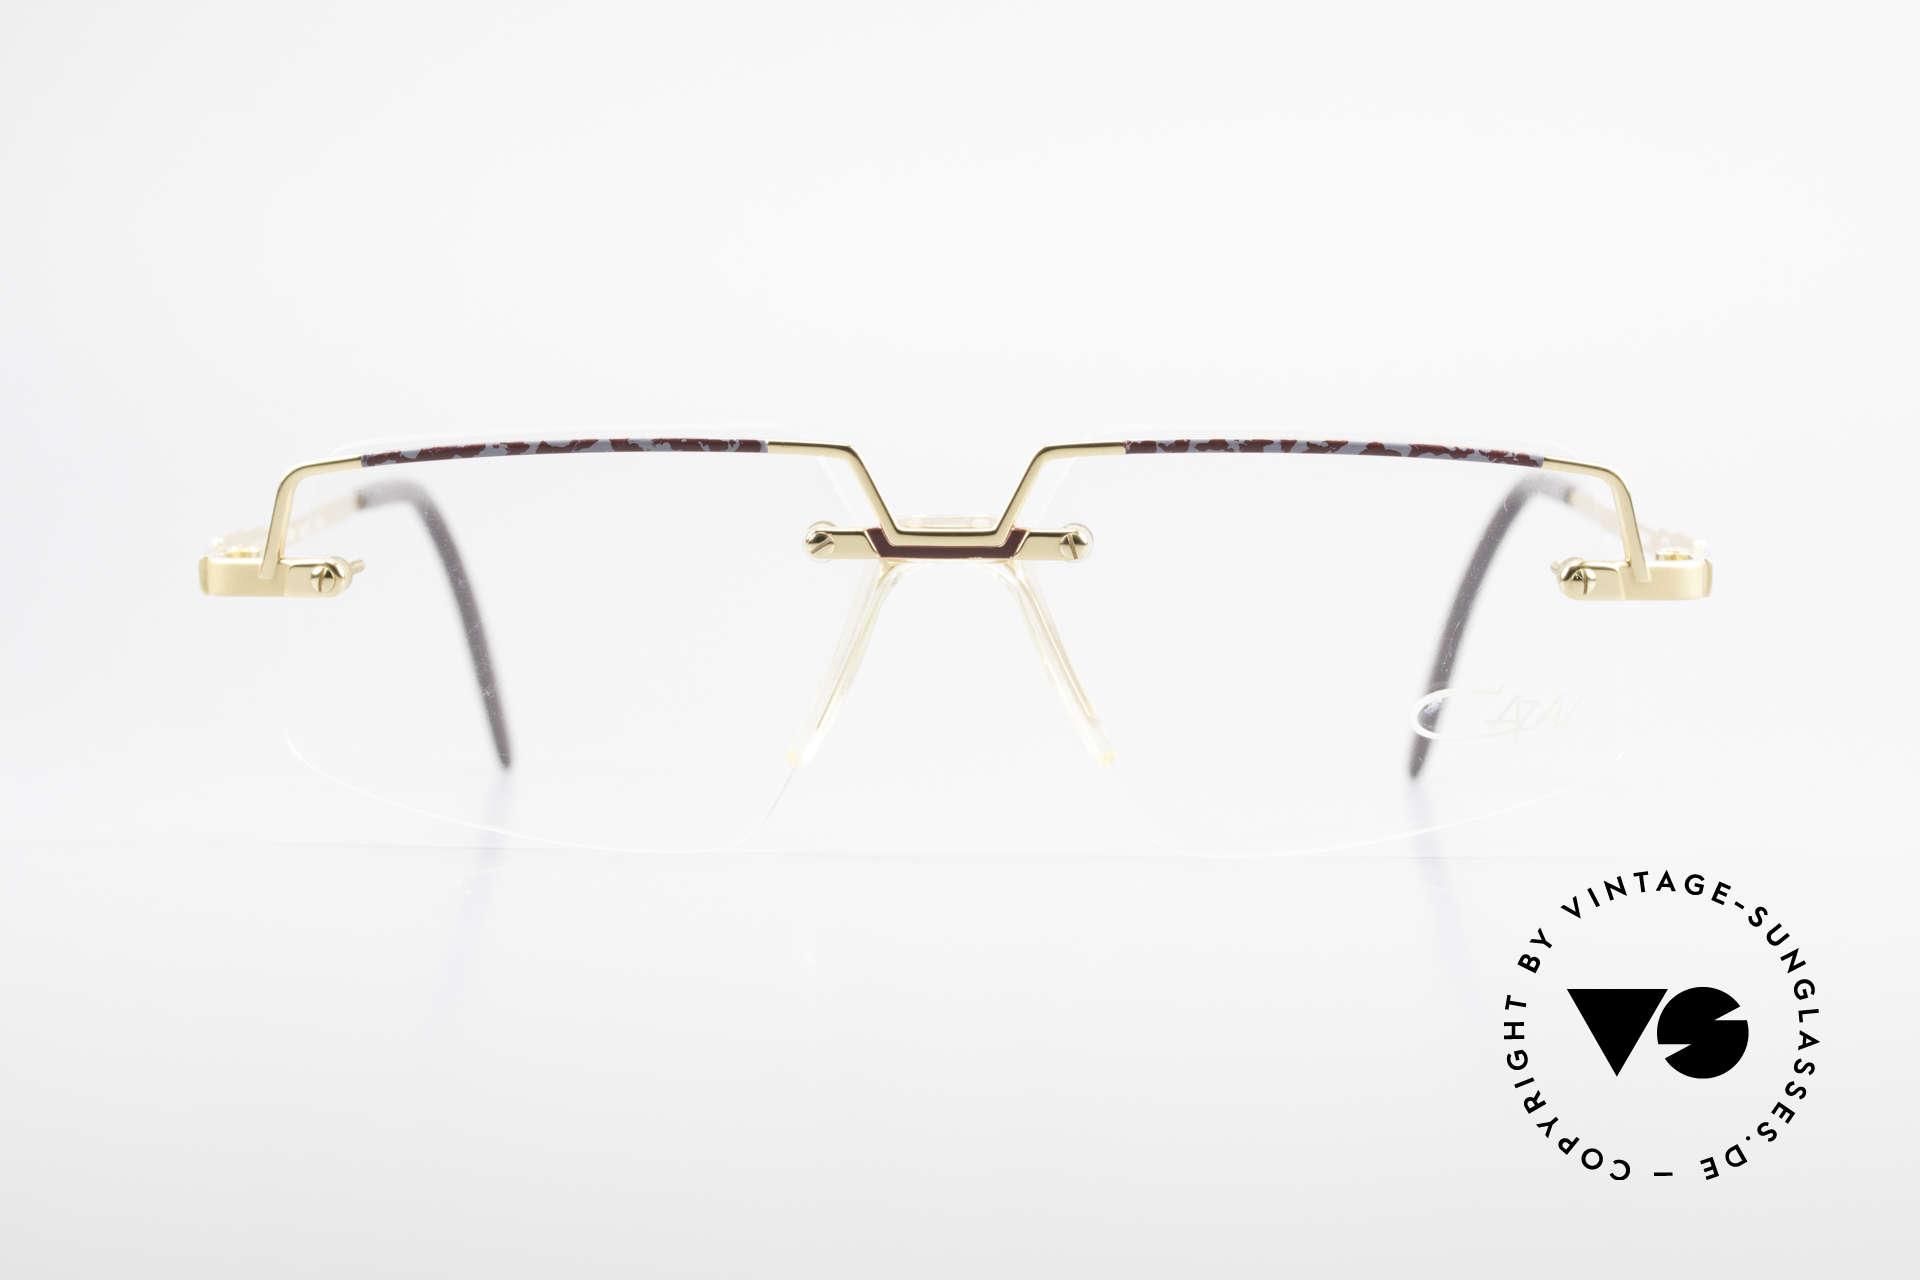 Cazal 742 Vintage Cazal Frame Rimless, interesting combination of lenses and frame, Made for Men